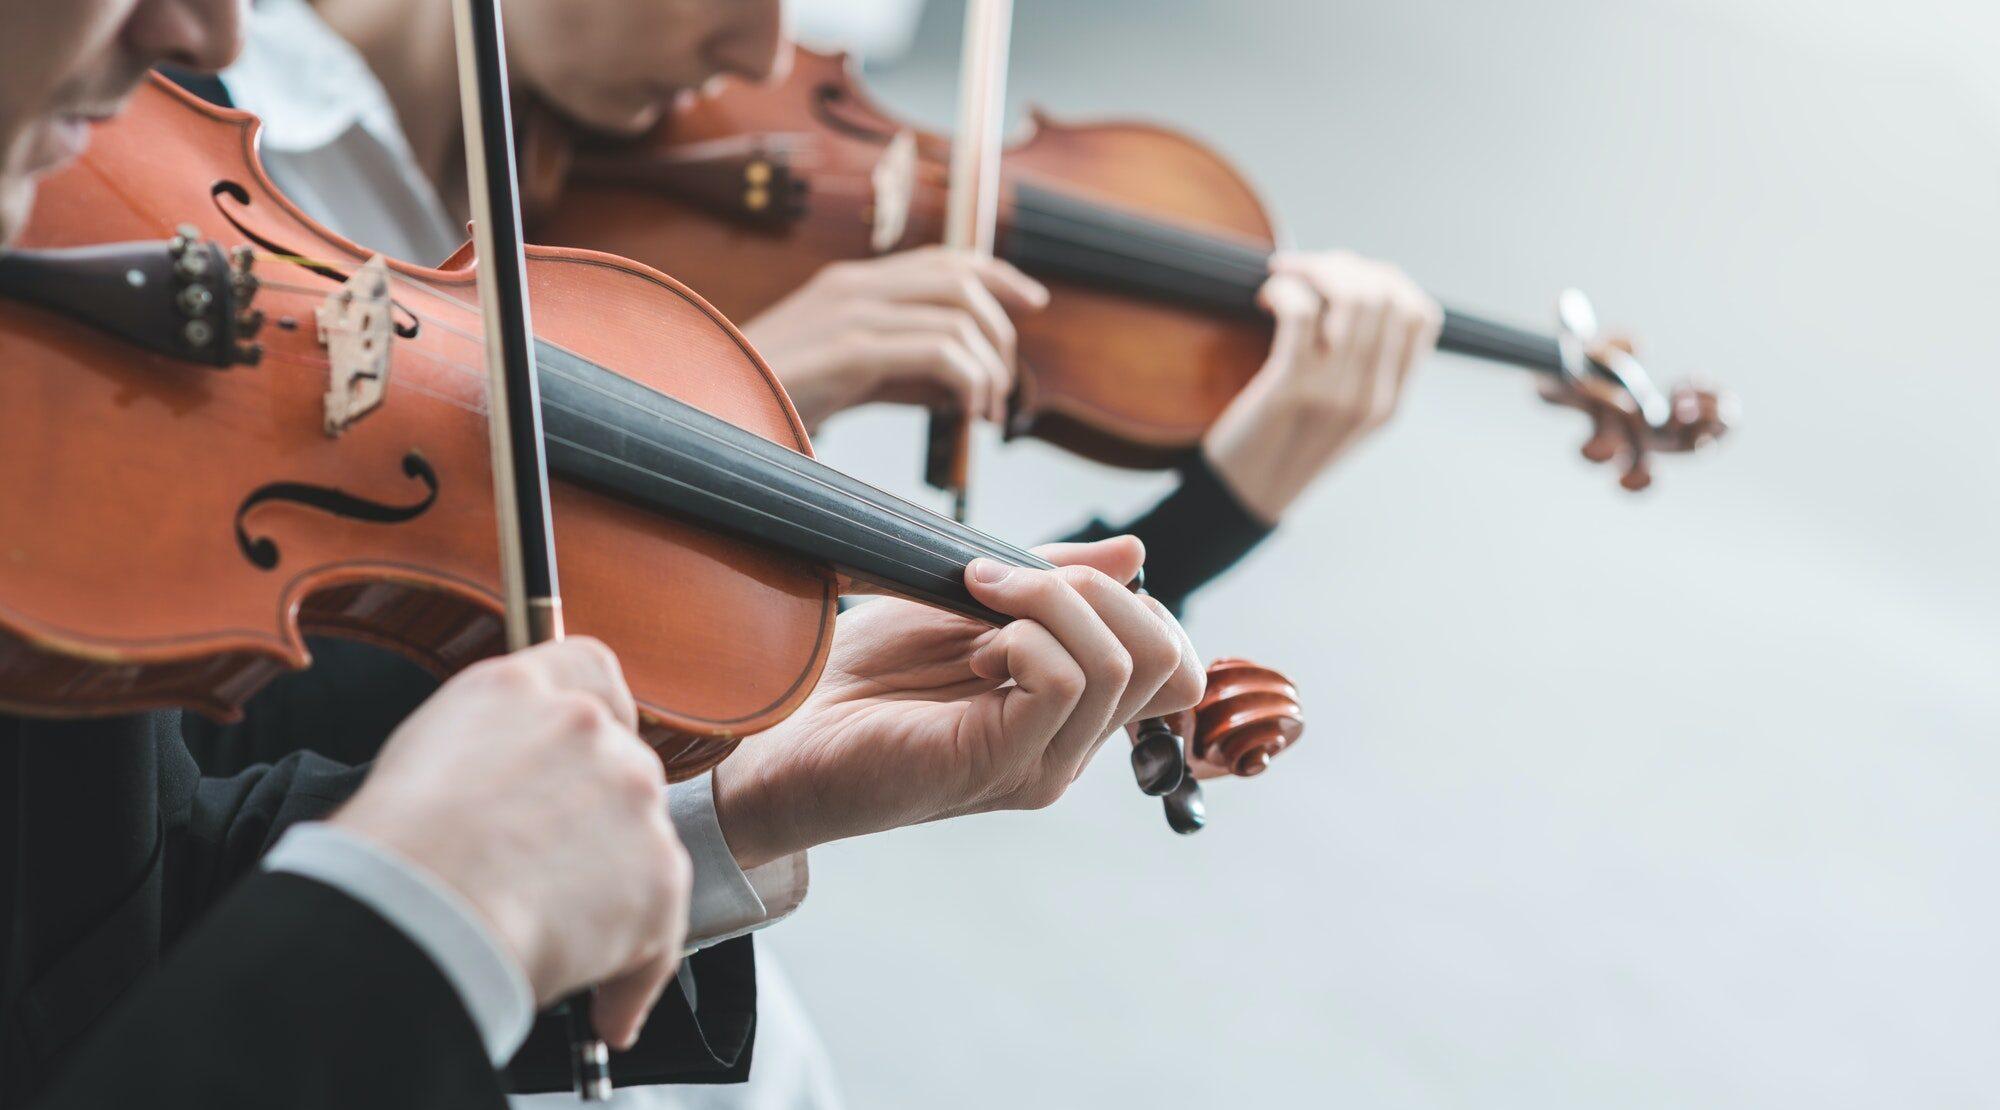 Unimusic poster в Неаполе, фестиваль музыки и культуры с оркестром New Scarlatti